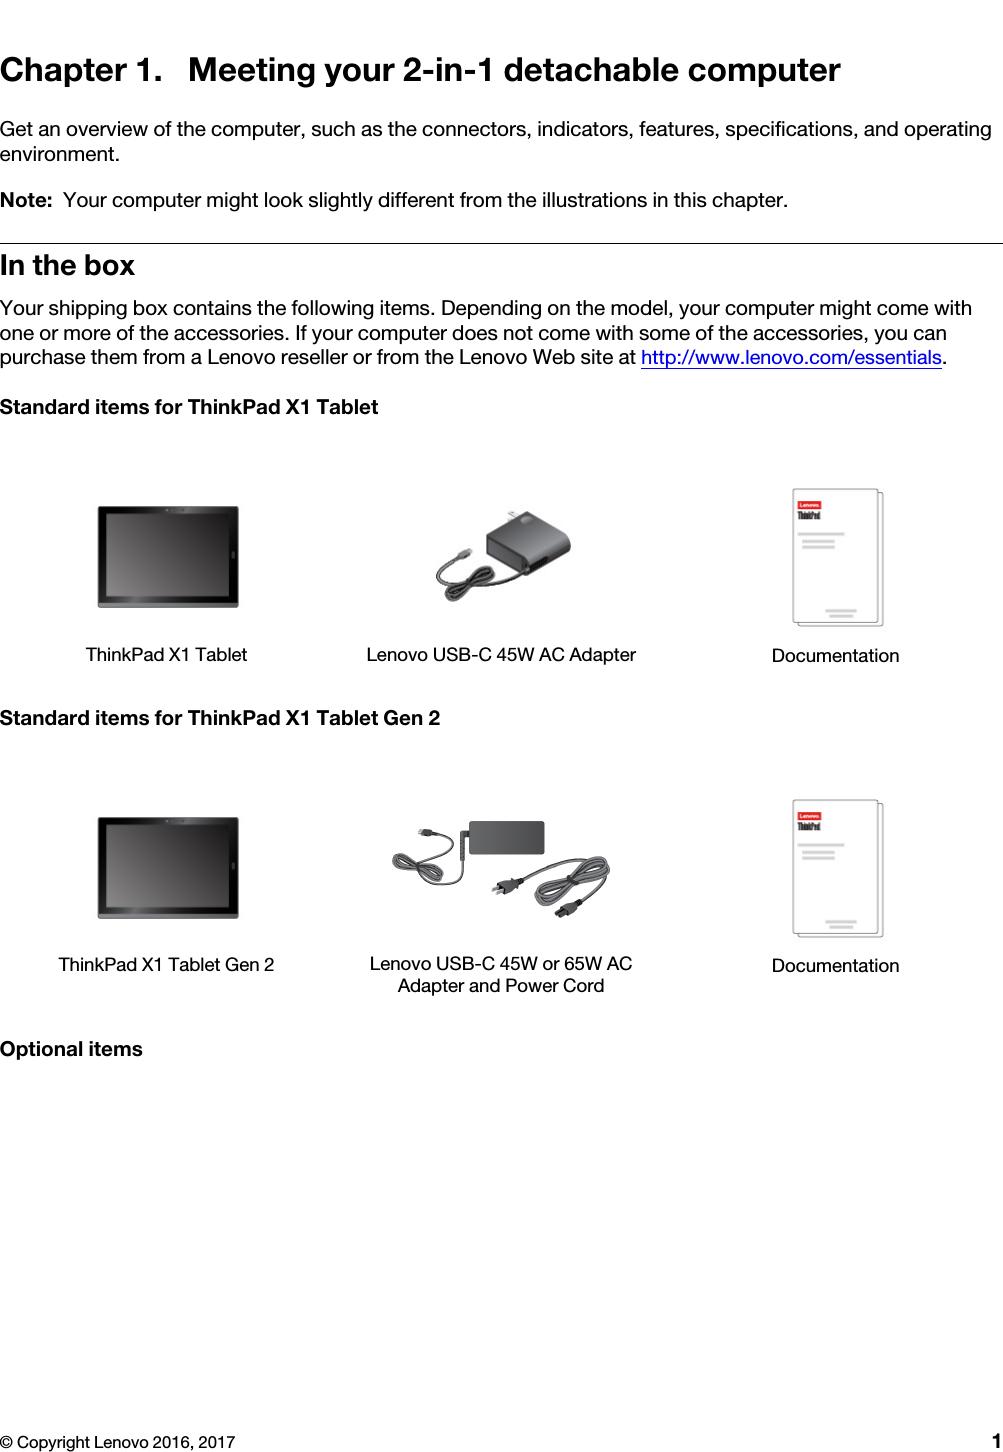 Lenovo X1 Tablet Gen 2 Ug En / User Guide Manual (English) Think Pad